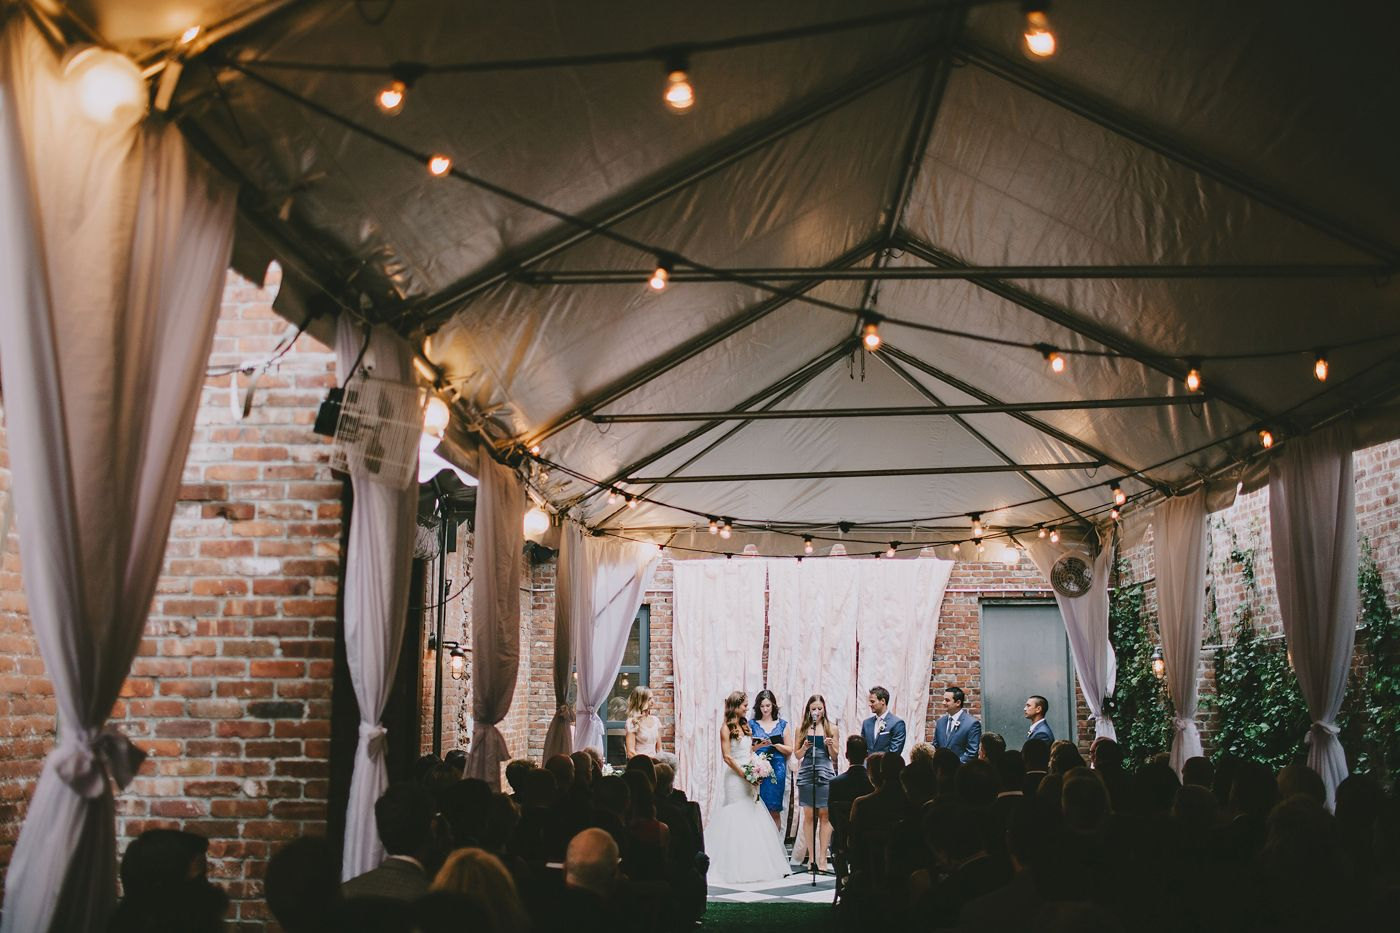 Wythe Hotel Wedding Jessalyn Rob S Beautiful At The Outdoor Garden